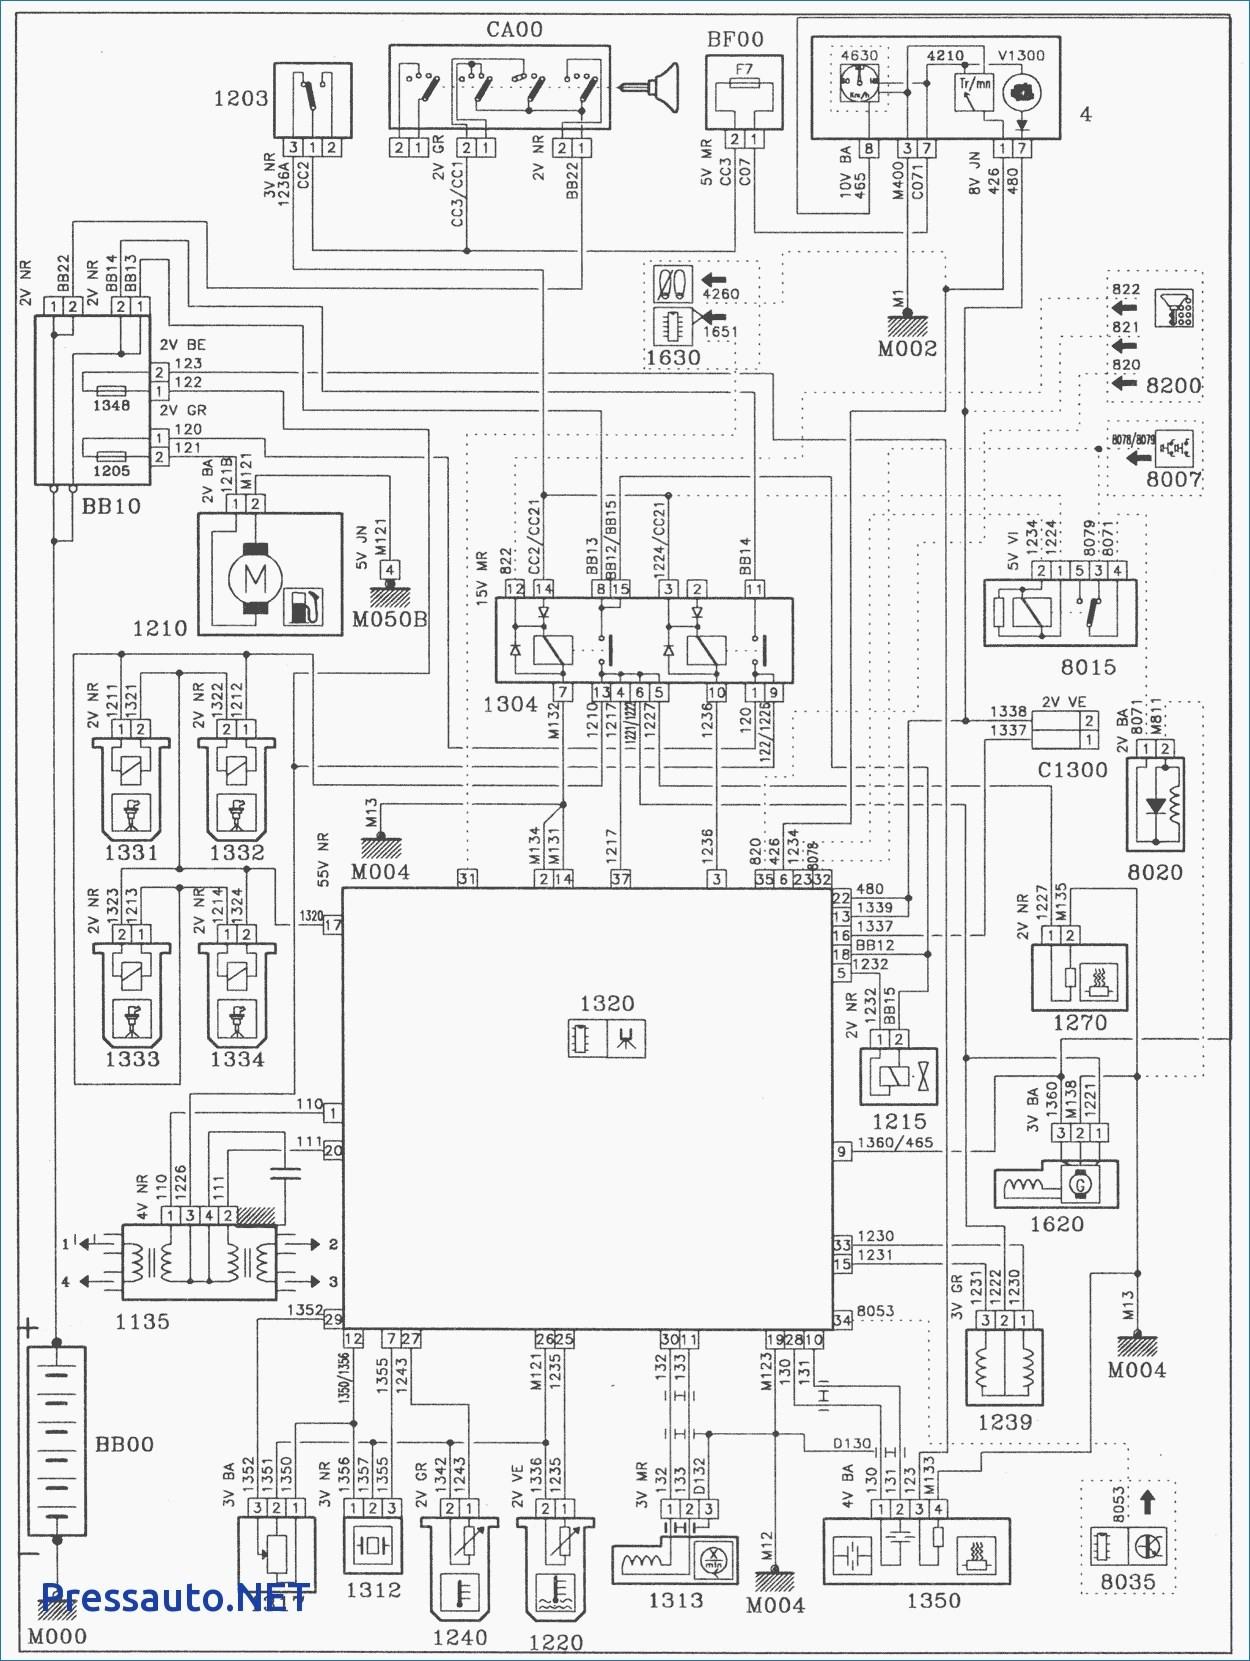 wiring diagram as well as arb air locker pressor wiring diagram